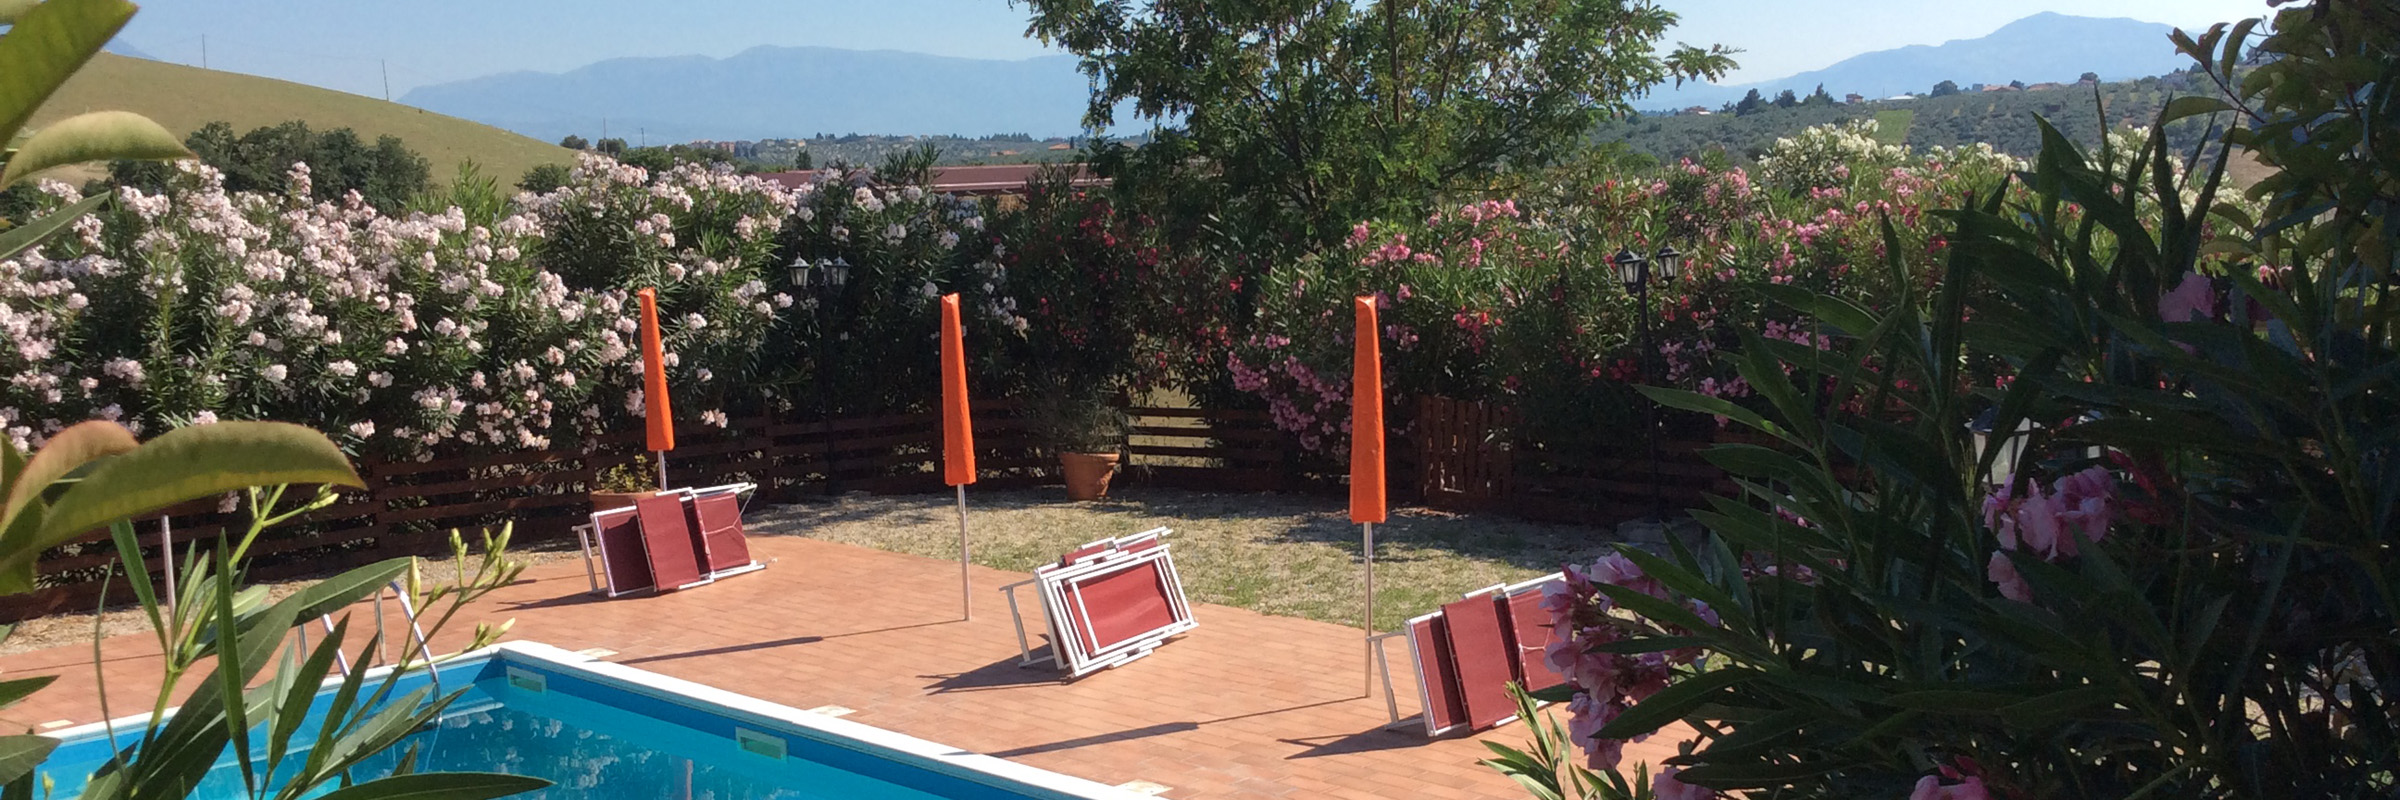 piscina15